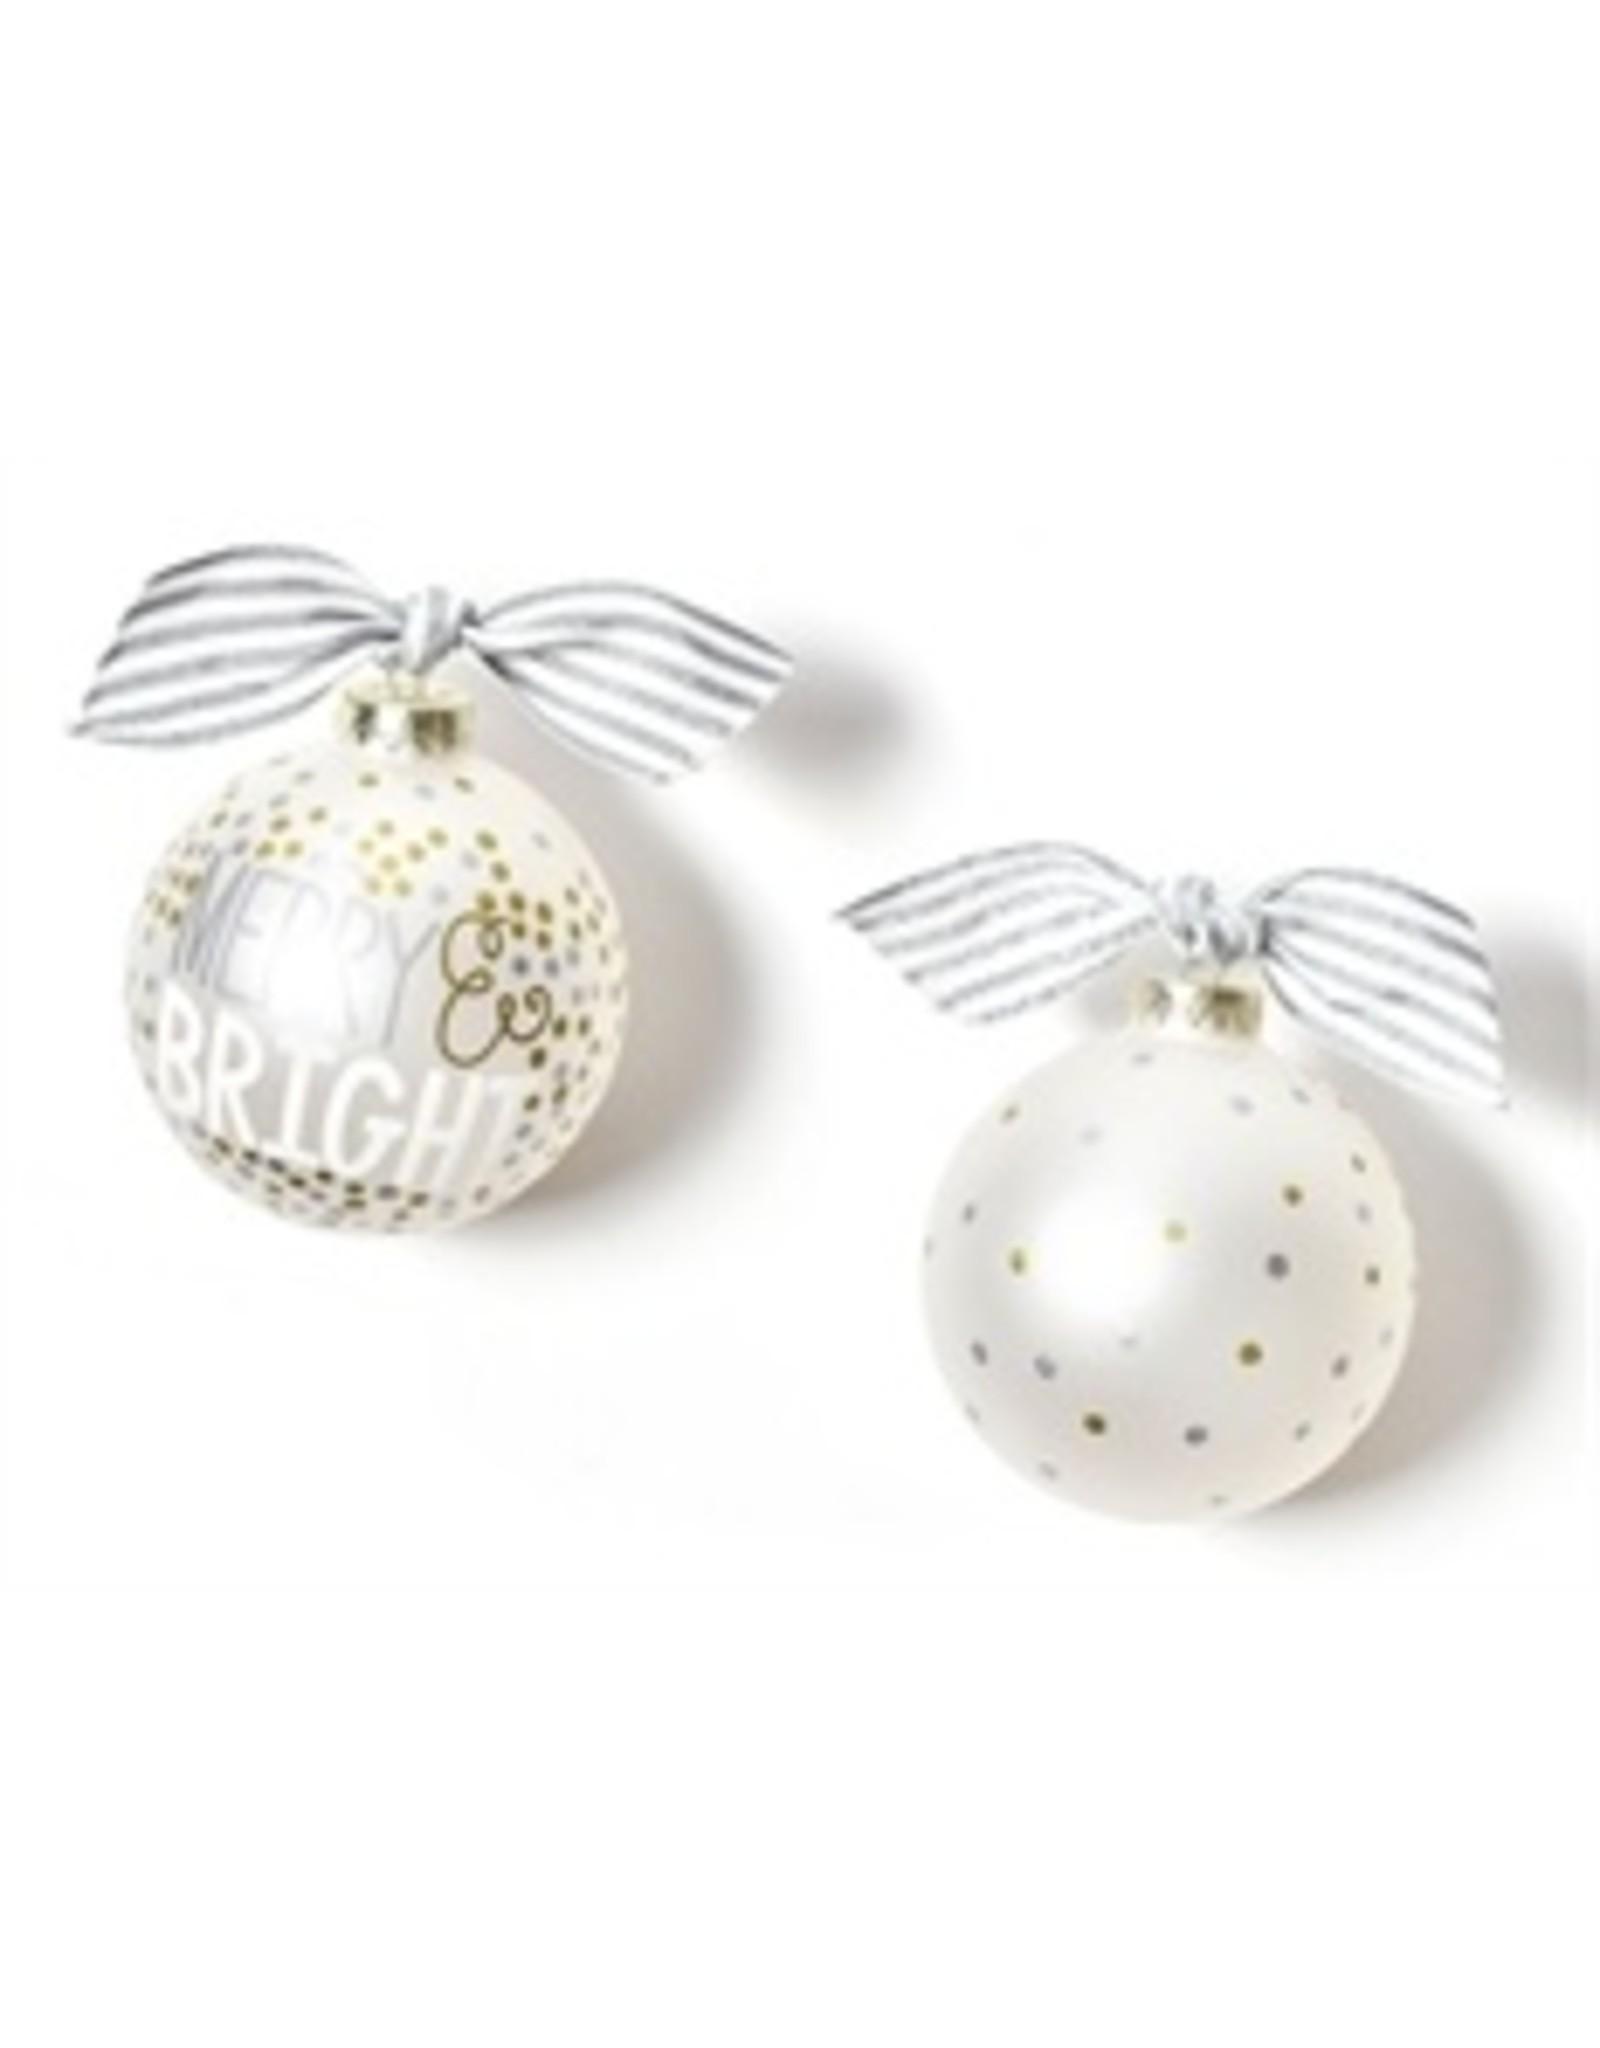 Merry & Bright Dot Ornament